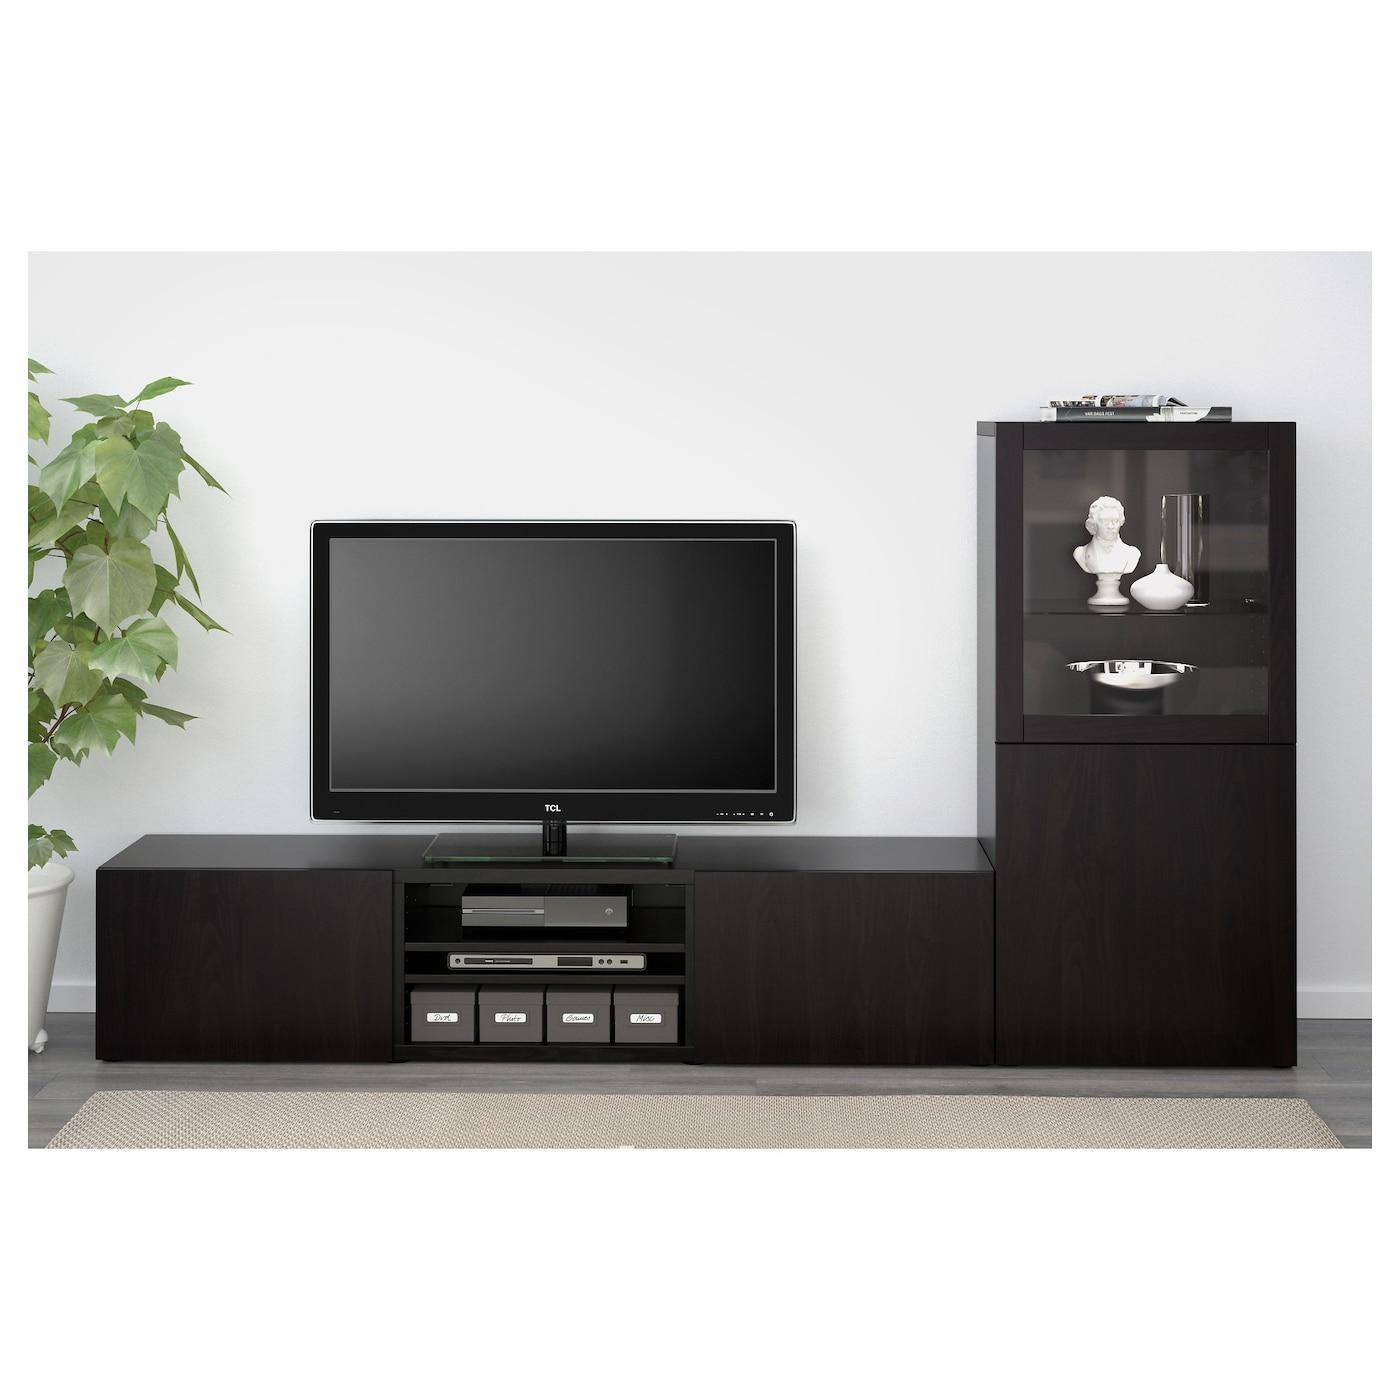 lappviken door drawer front black brown 60 x 38 cm ikea. Black Bedroom Furniture Sets. Home Design Ideas